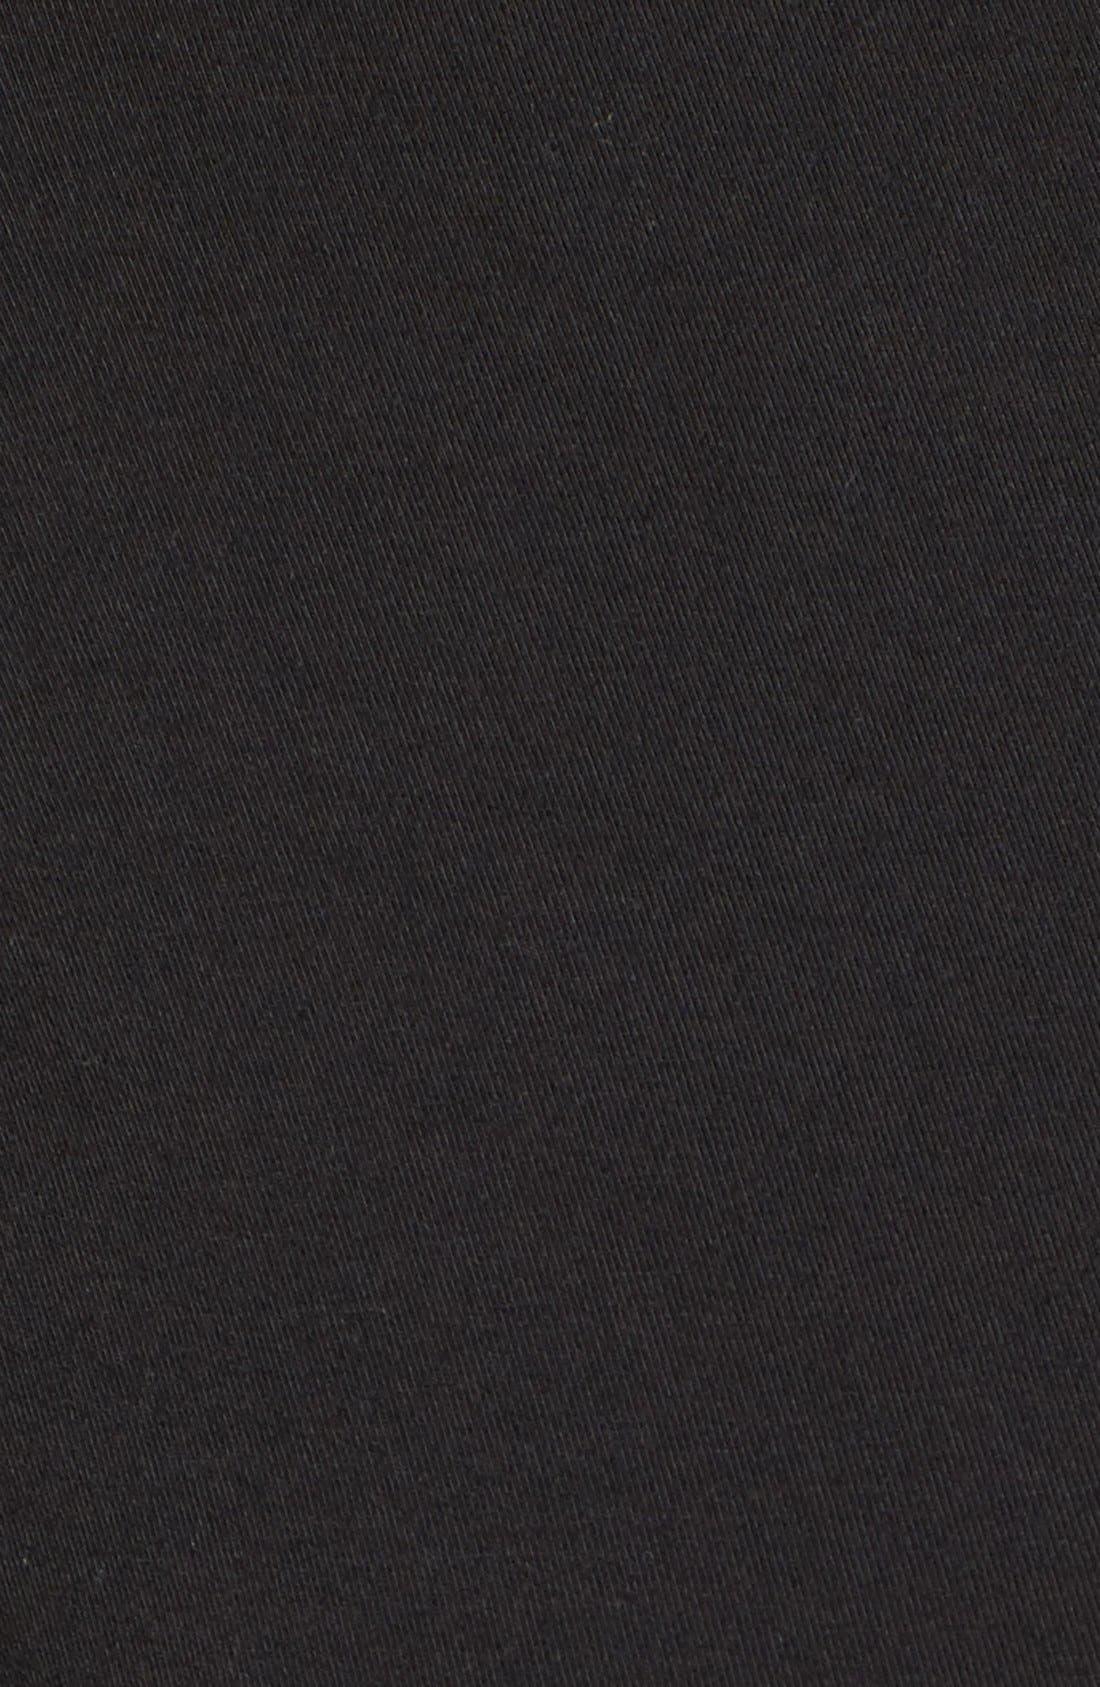 Tart 'Peaches' Maternity Body-Con Dress,                             Alternate thumbnail 2, color,                             BLACK